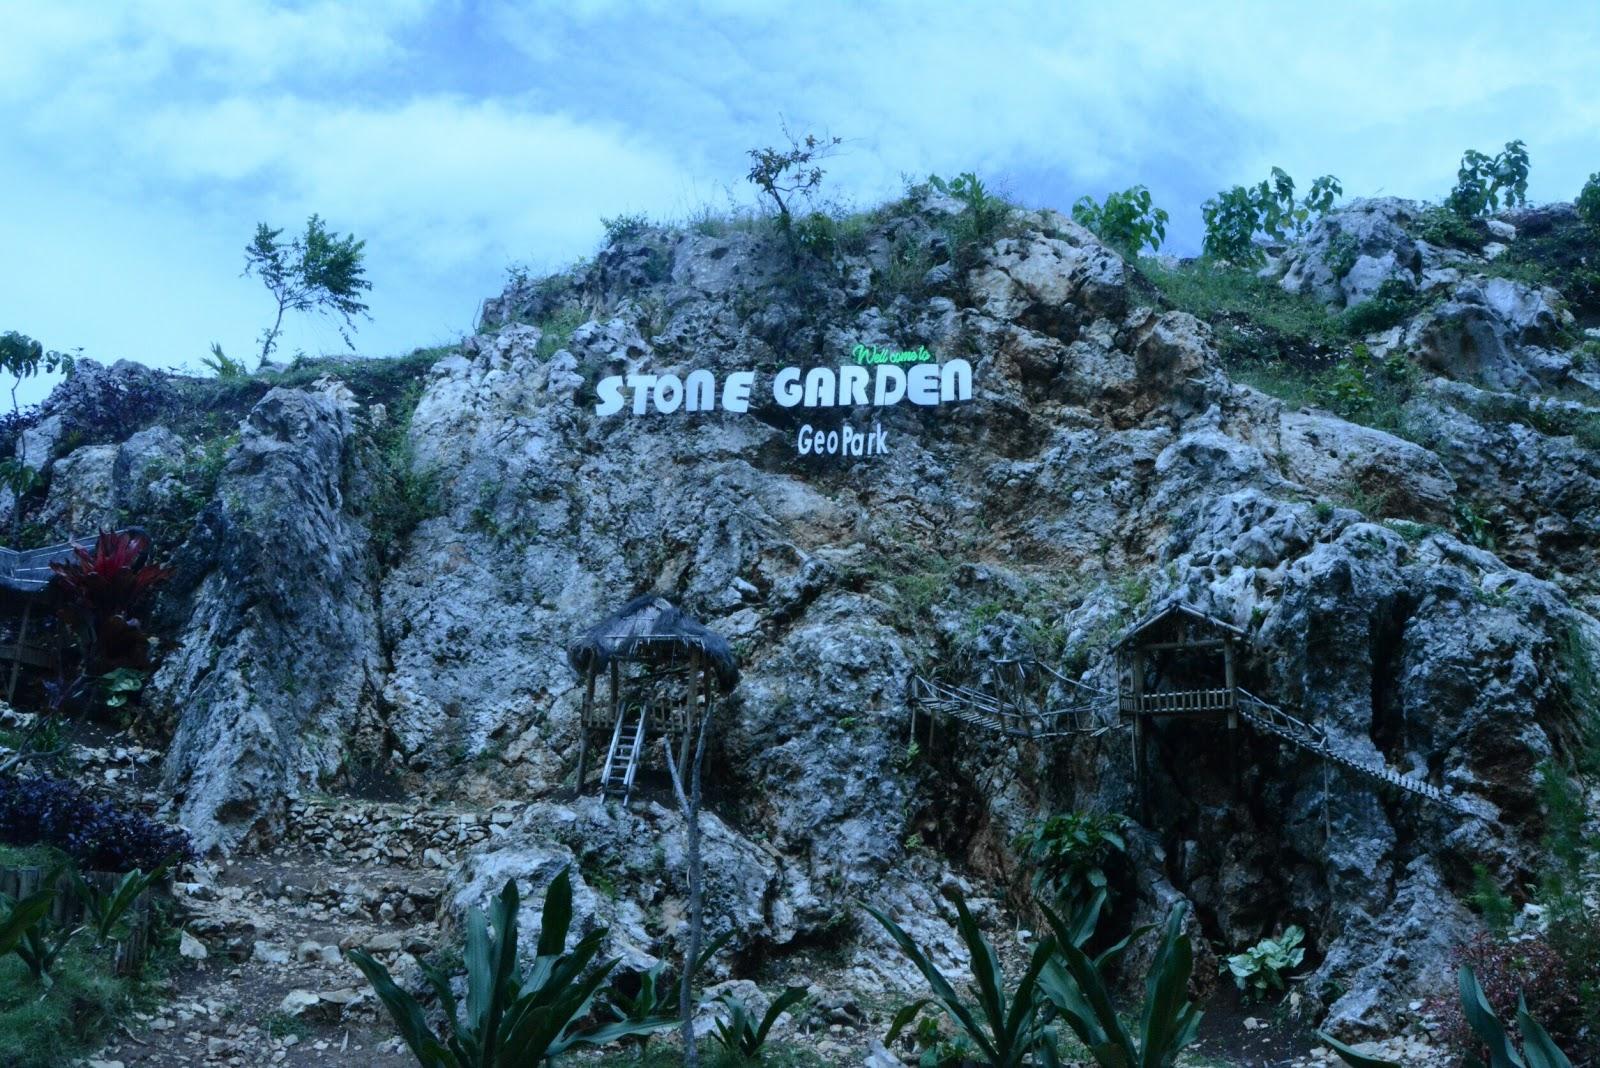 Jabar Overland 2017 Stone Garden Taman Batu Sebuah Tempat Tumpukan